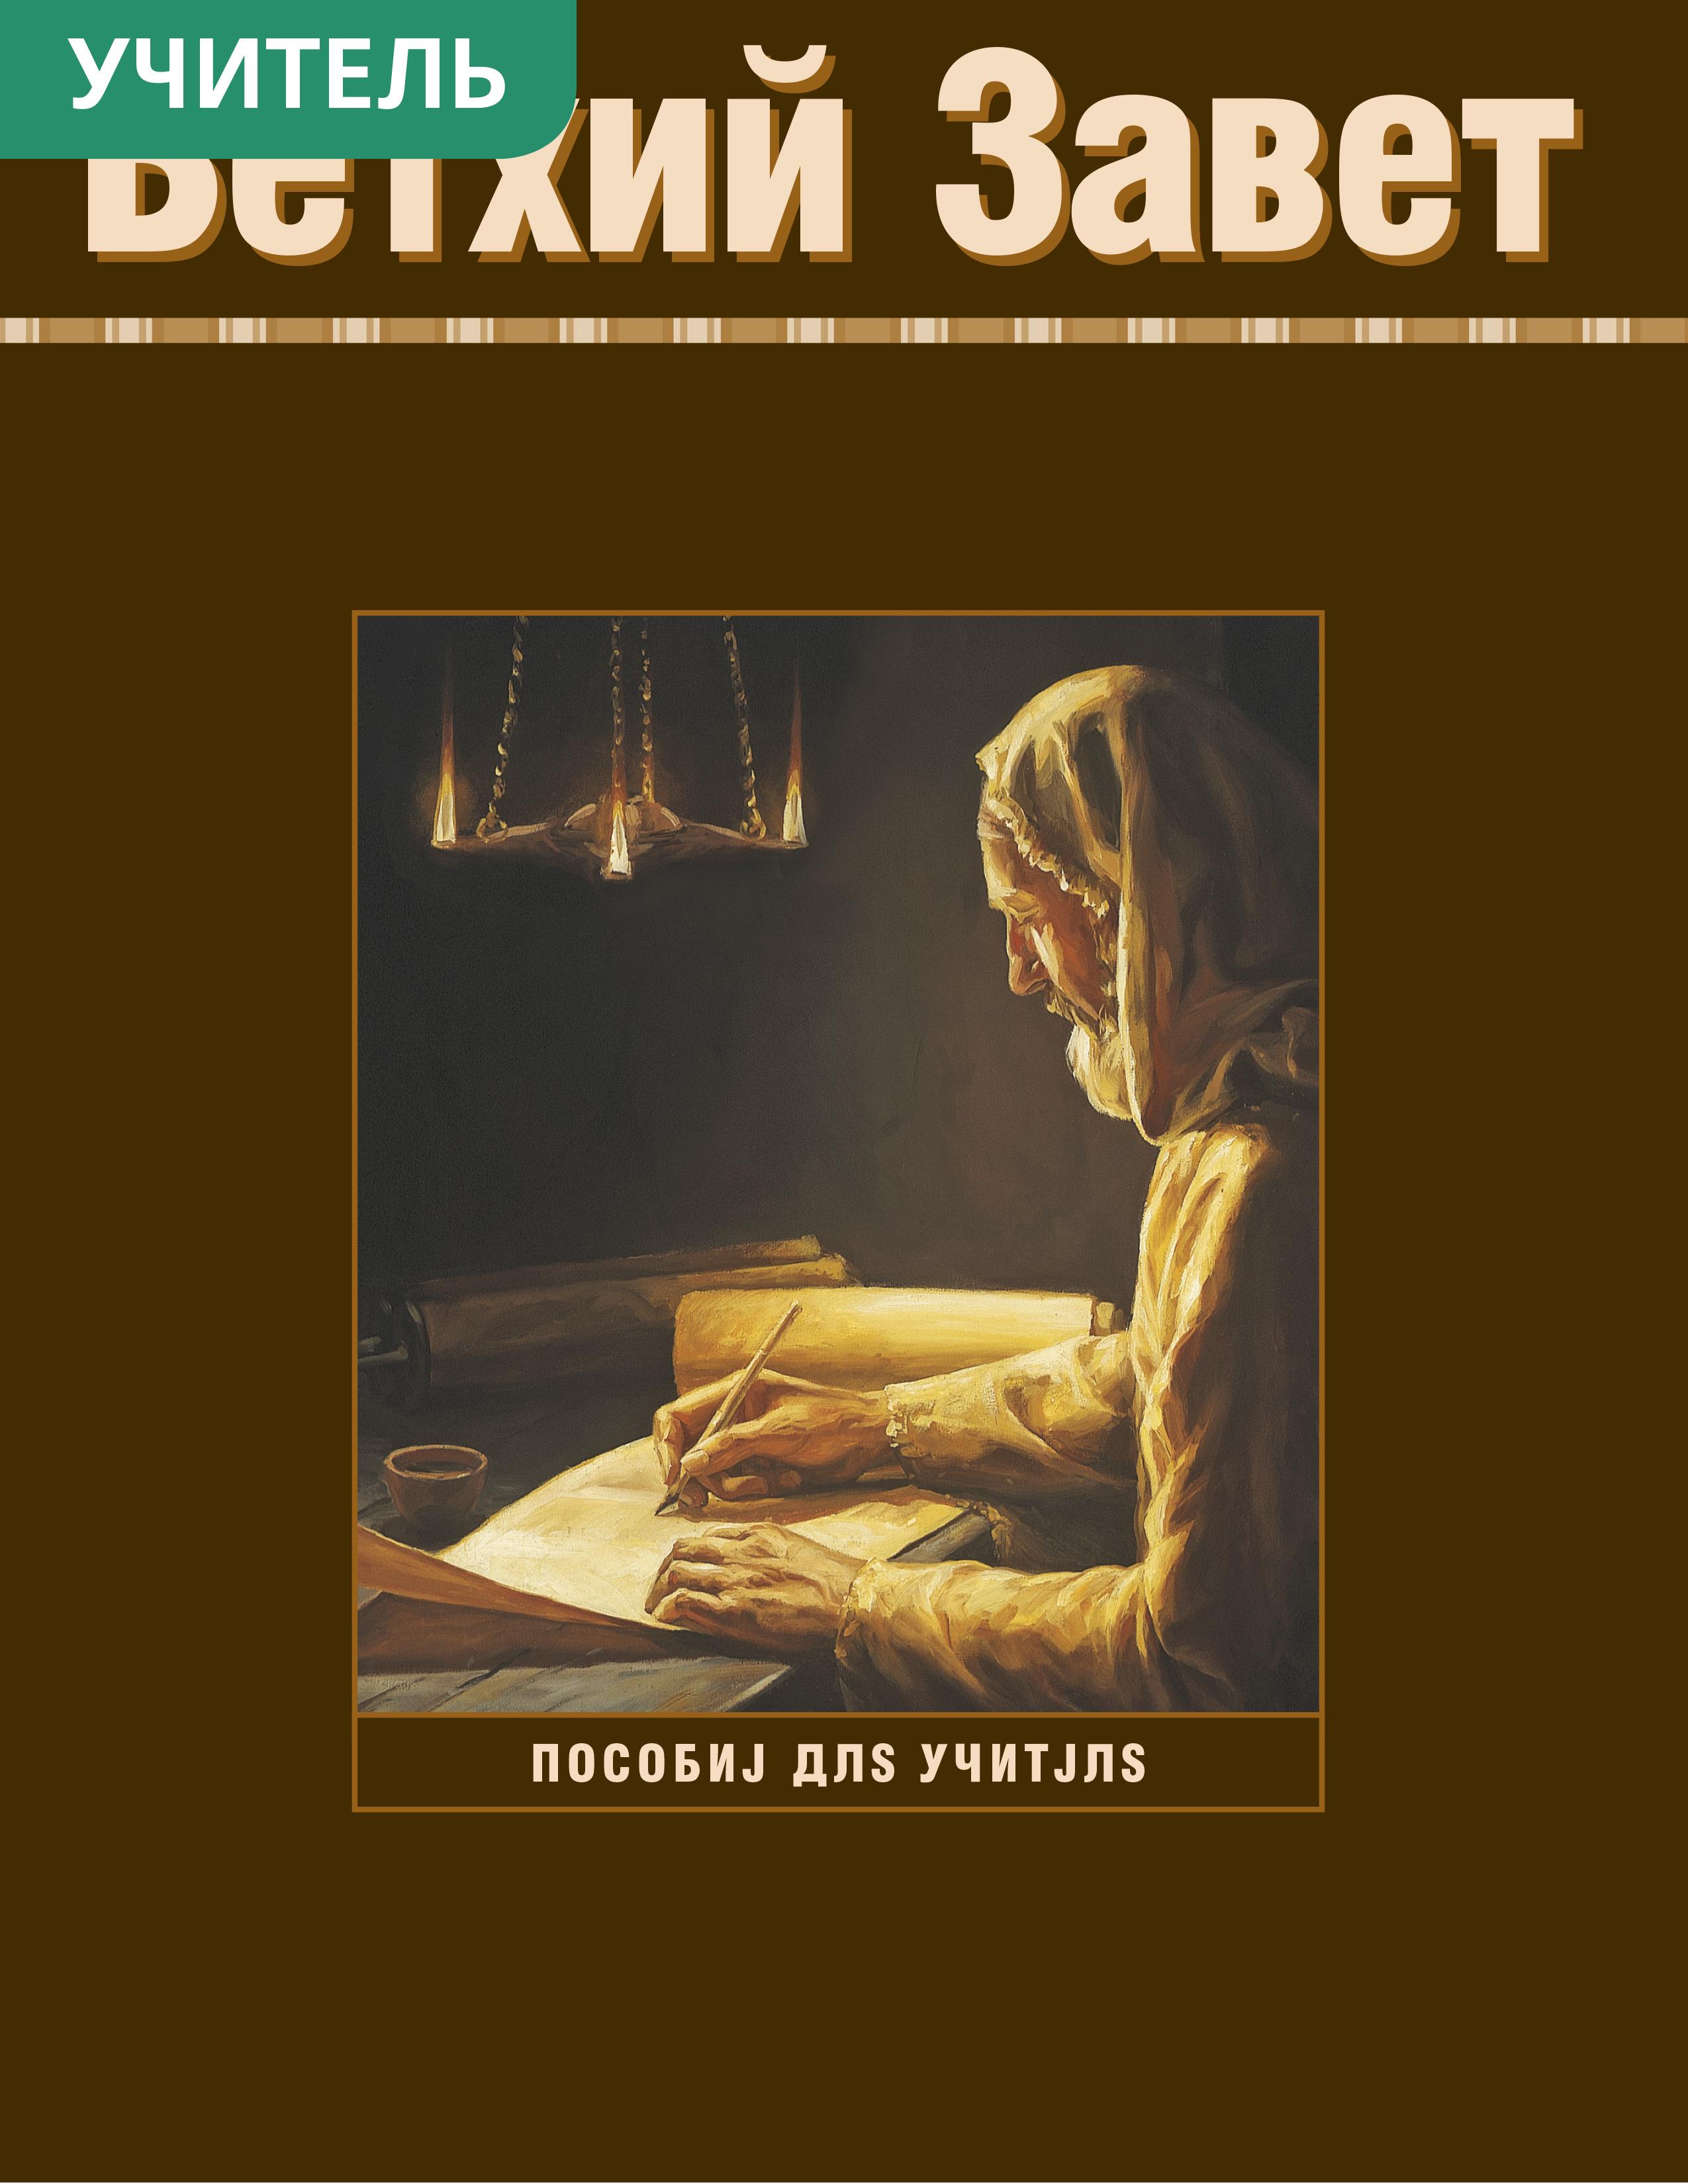 Ветхий Завет. Руководство для учителя семинарии